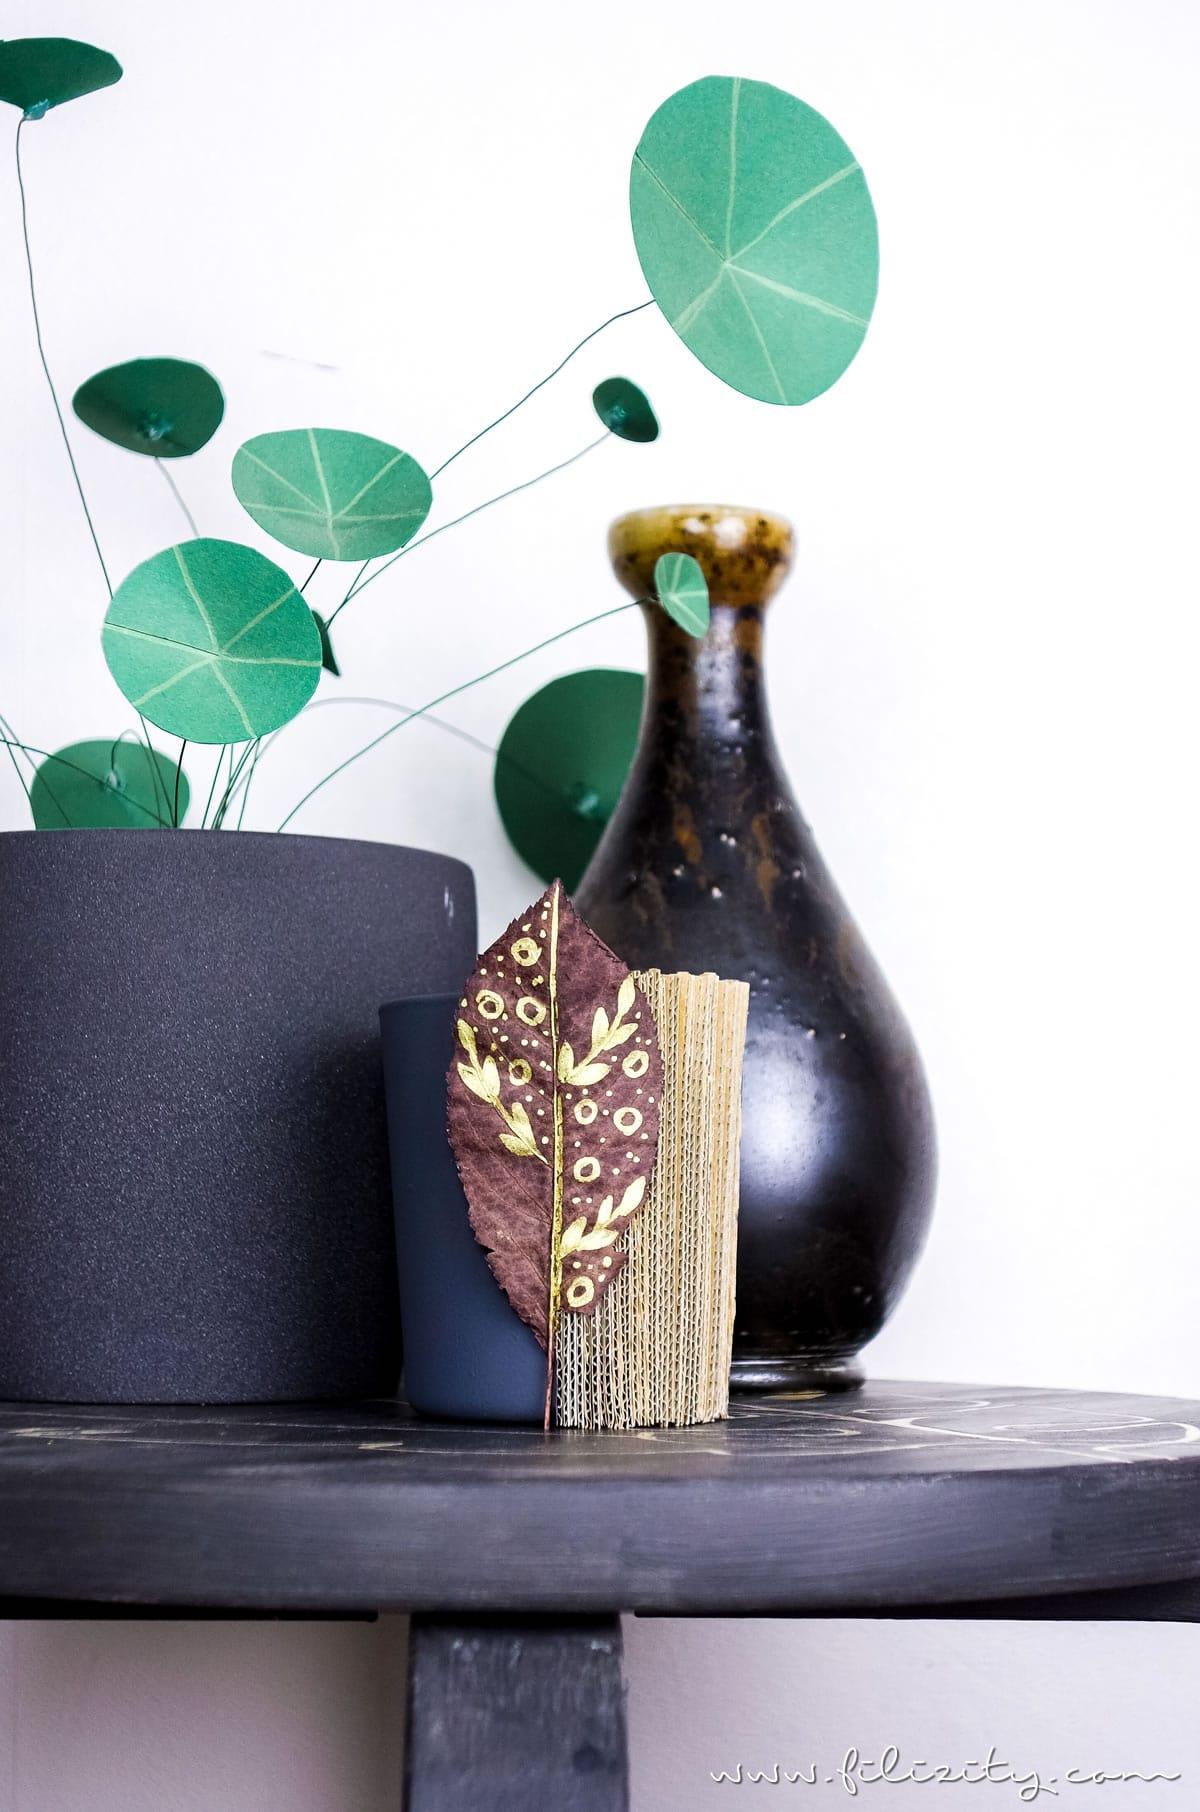 Upcycling Herbst-Deko: DIY Windlicht aus Versandkarton - 5 Blogs 1000 Ideen | Filizity.com - DIY Blog aus Rheinland #herbst #upcycling #5Blogs1000Ideen